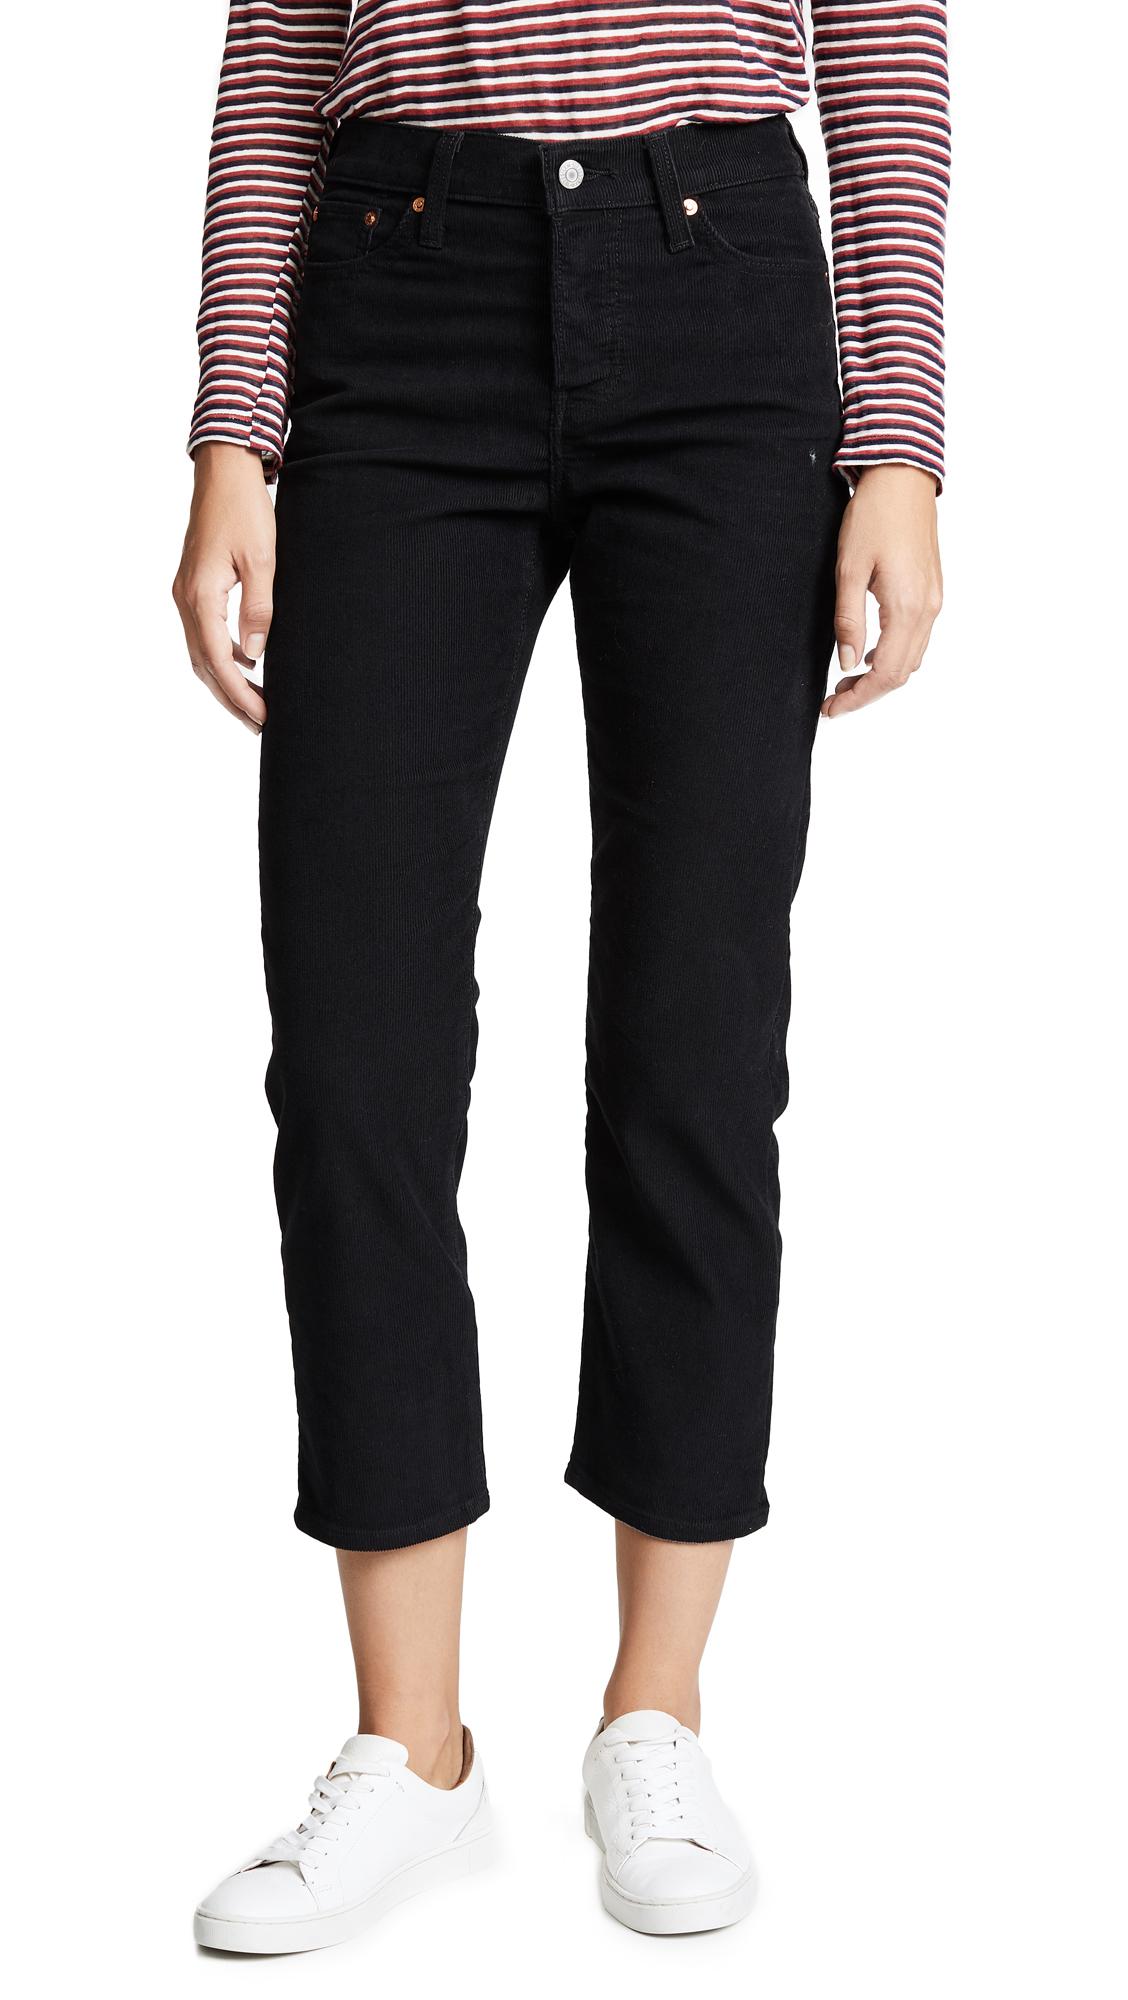 Wedgie Corduroy Straight Jeans, Black